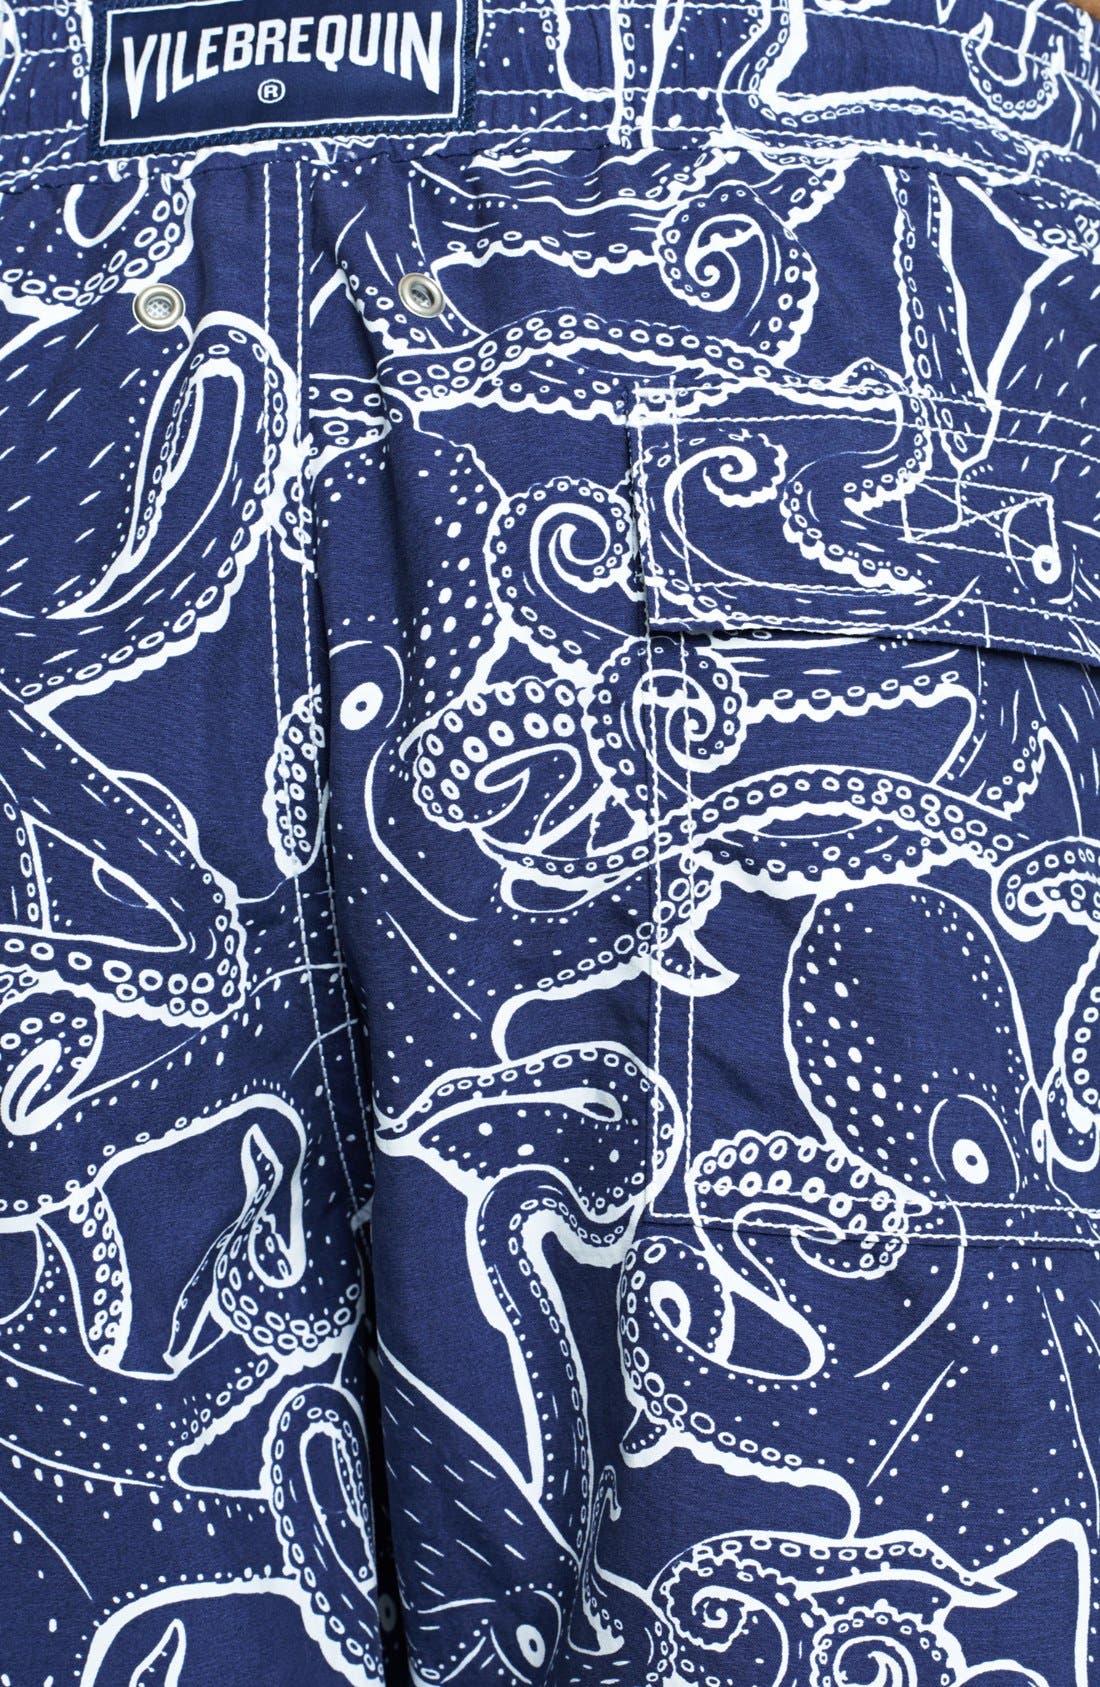 Alternate Image 3  - Vilebrequin 'Moorea' Octopus Print Swim Trunks